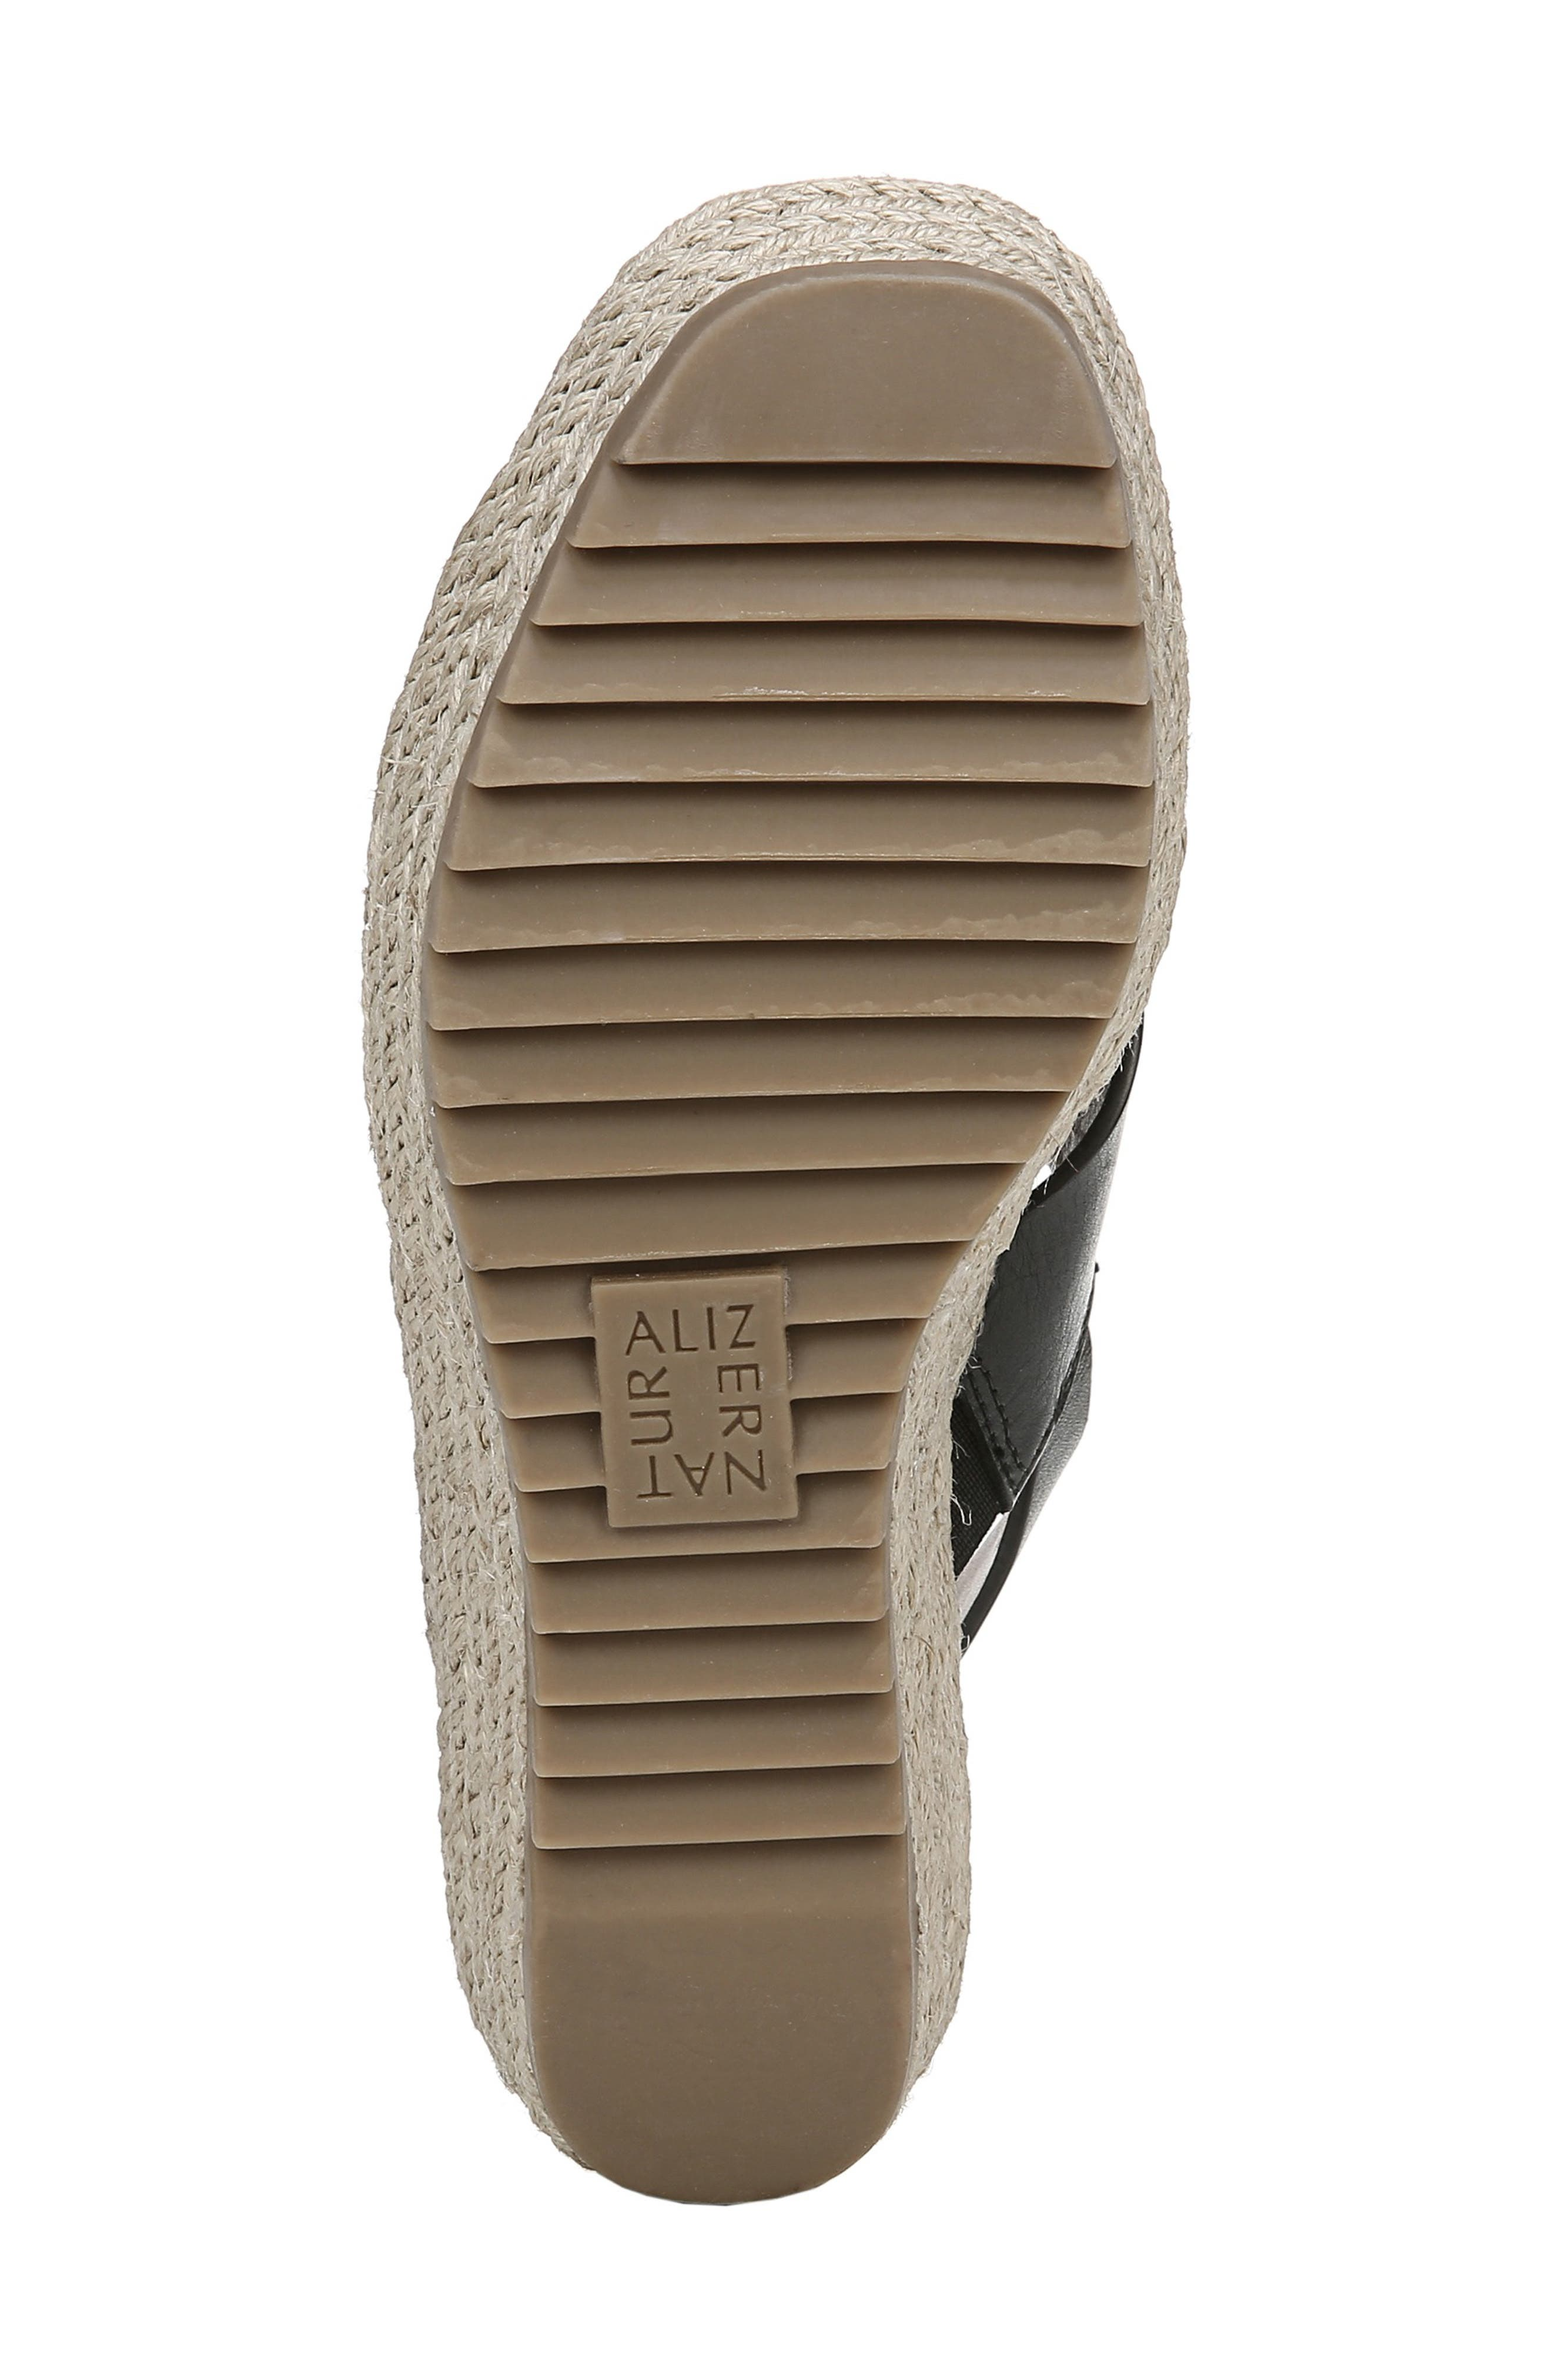 NATURALIZER, Oak Espadrille Wedge Sandal, Alternate thumbnail 6, color, BLACK LEATHER